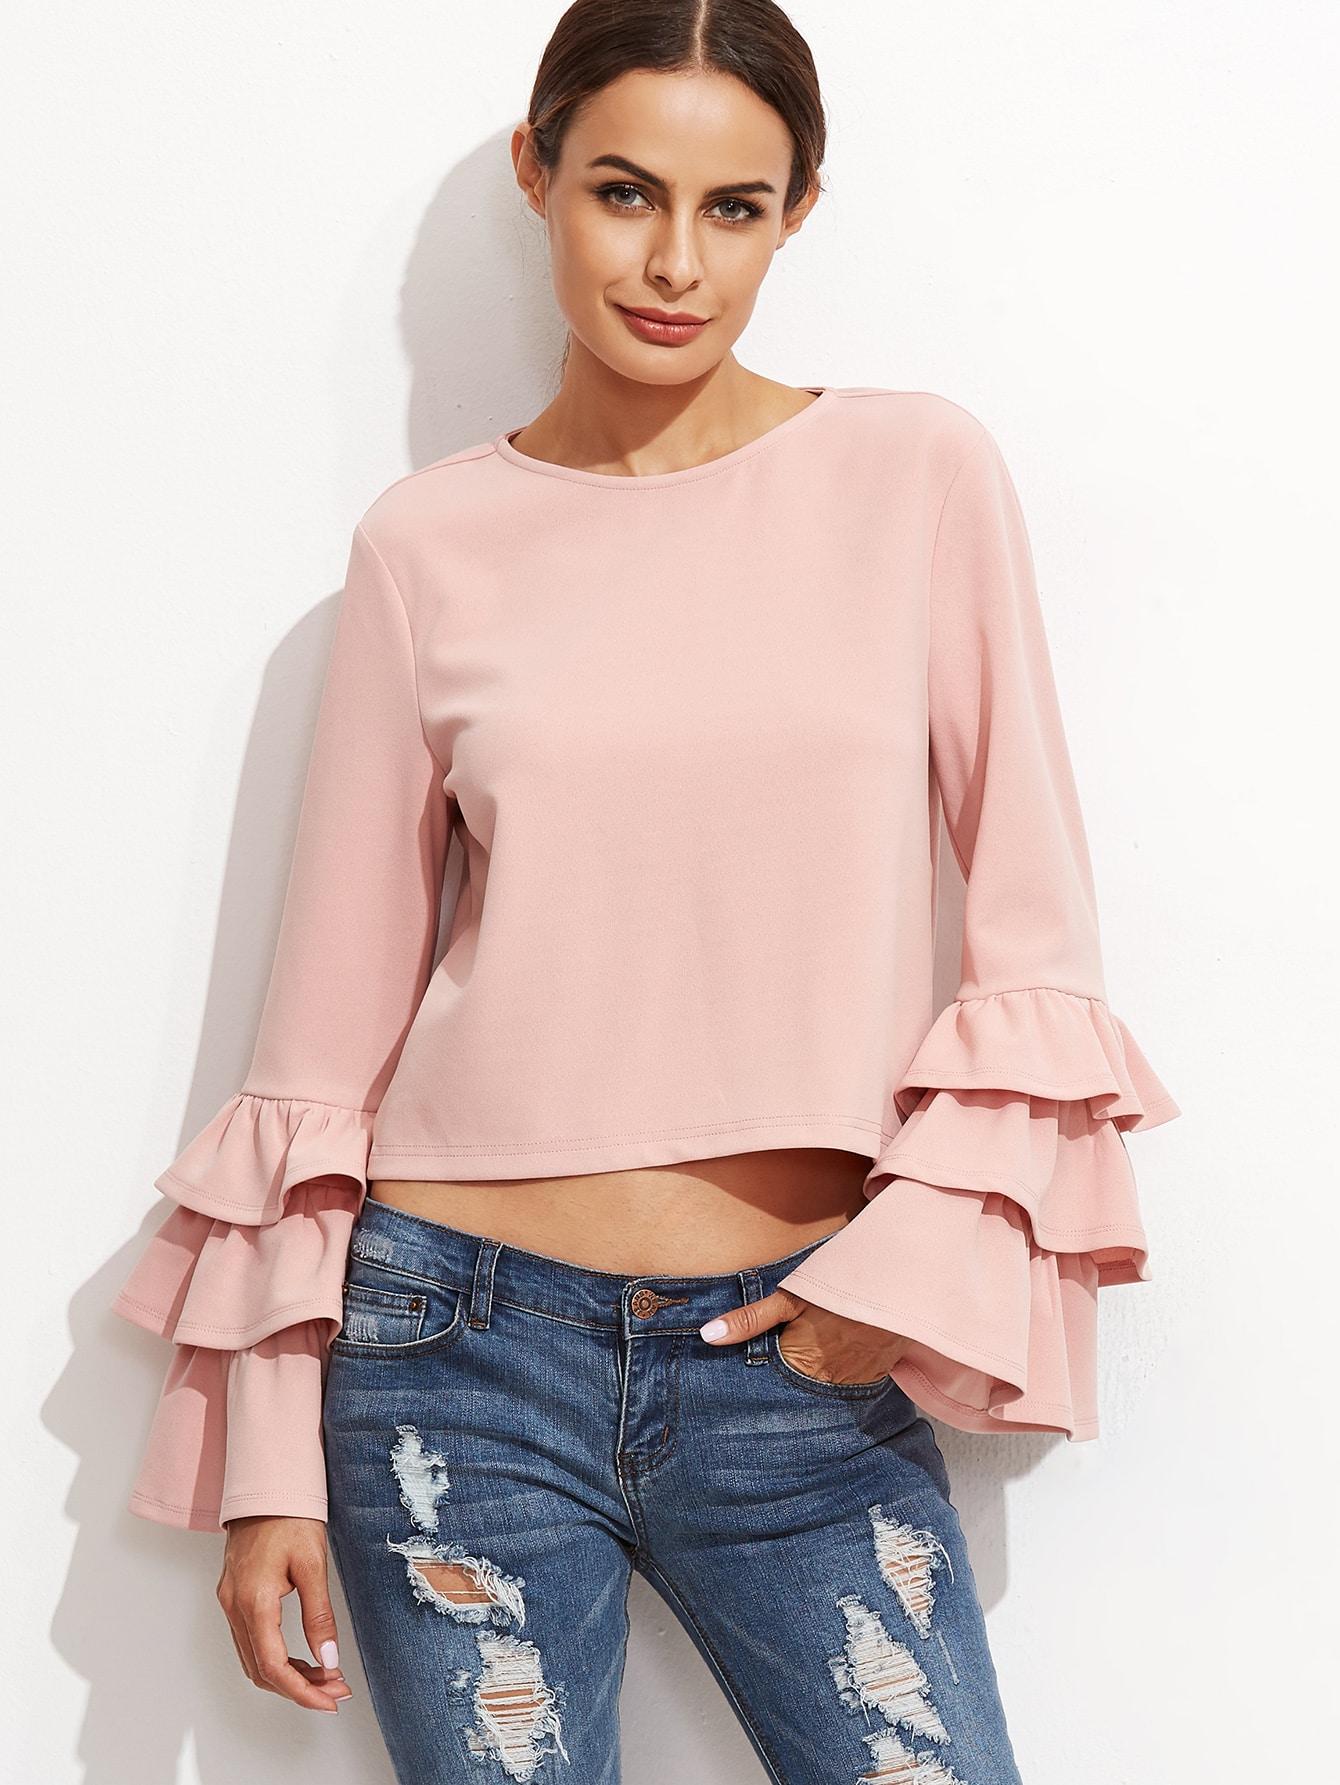 blouse161024711_2